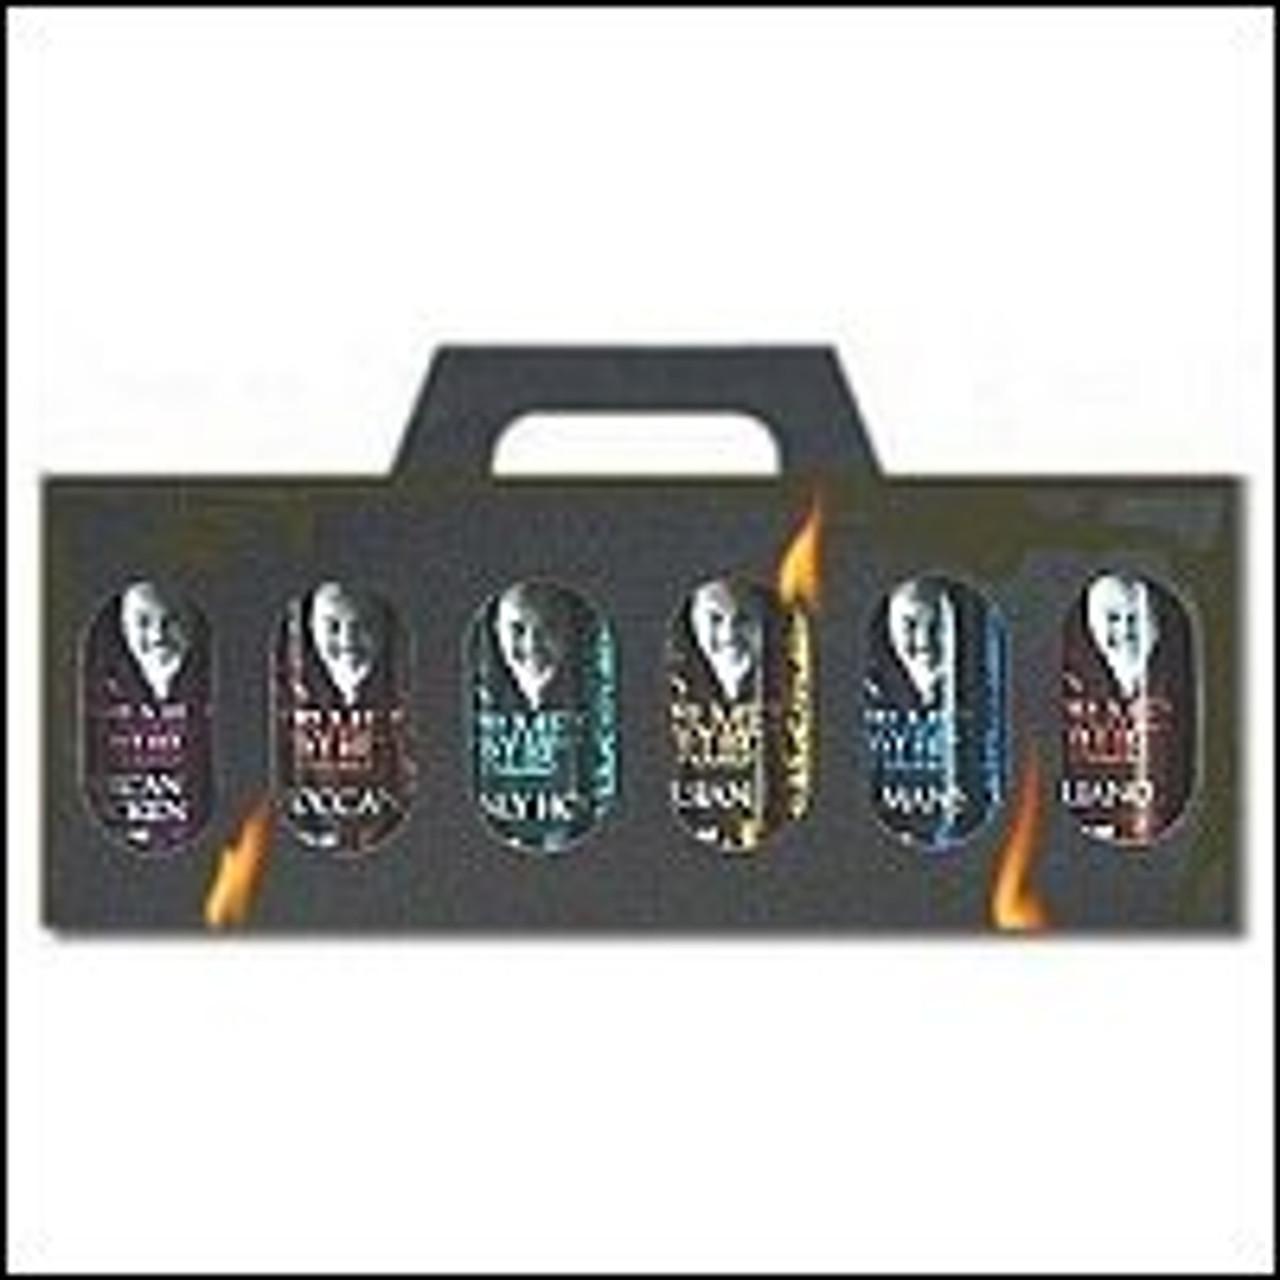 BBQ Gourmet Rubs - Six-pack in Giftbox